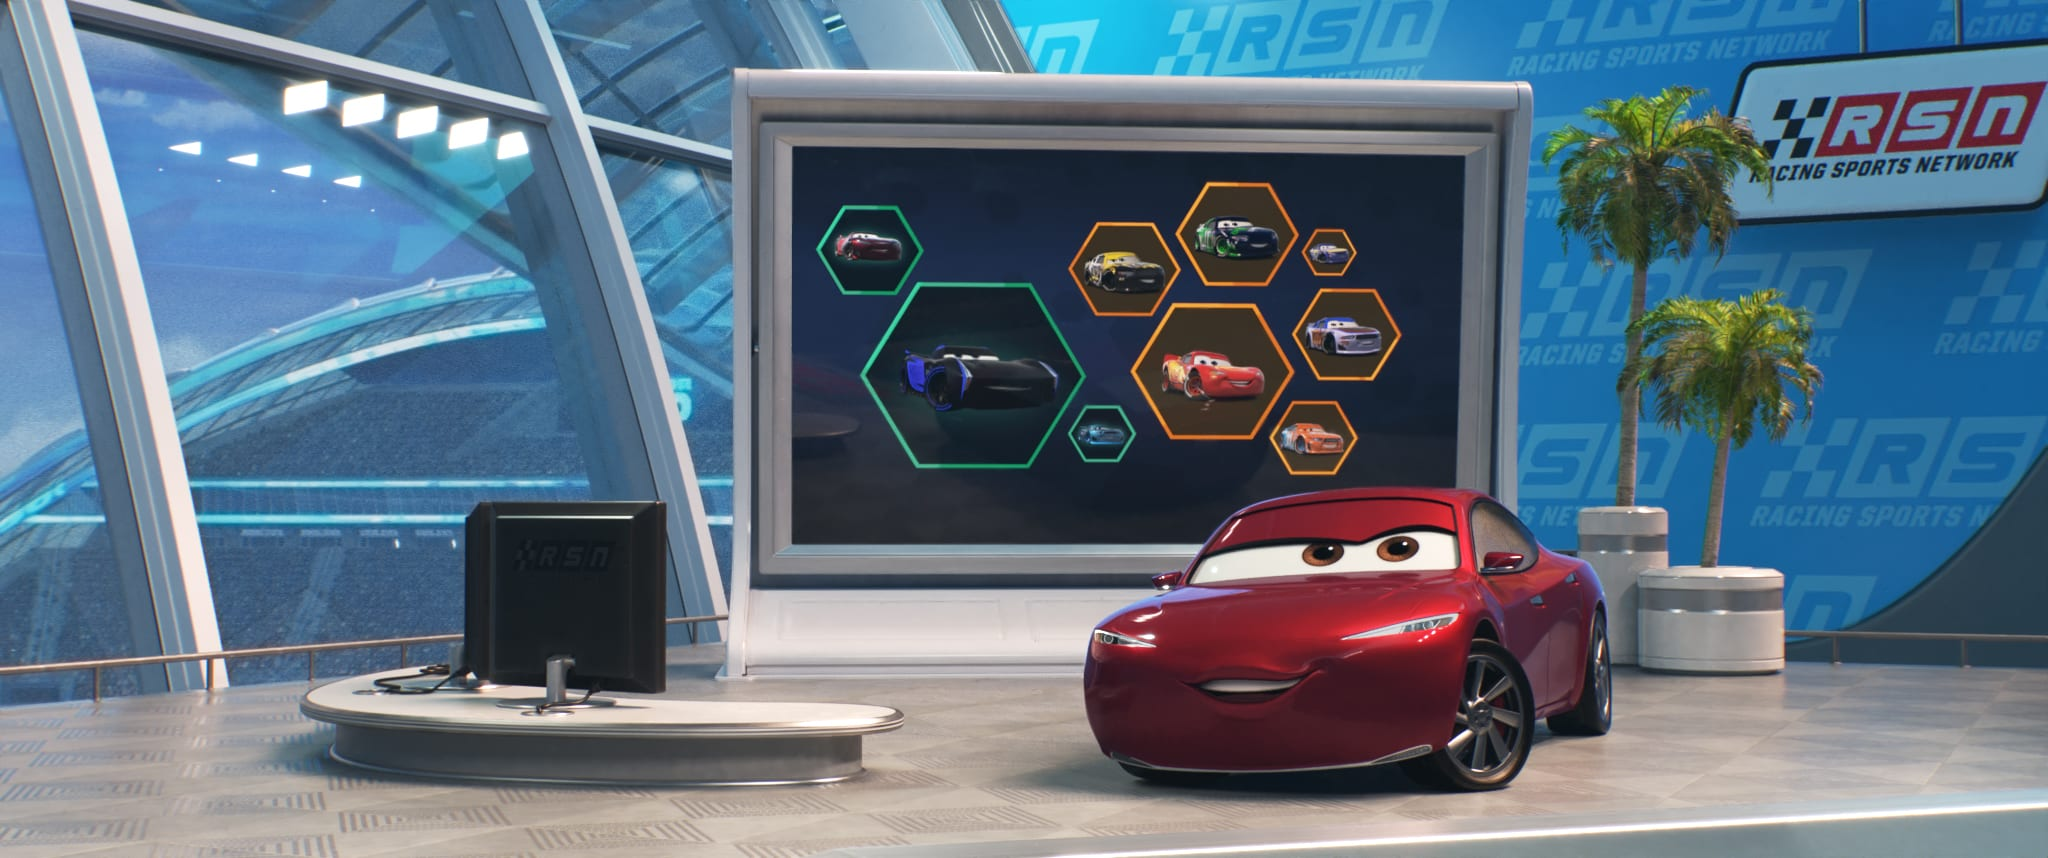 Disney Pixar's #Cars3 Comes To Life At El Capitan Theatre In Hollywood